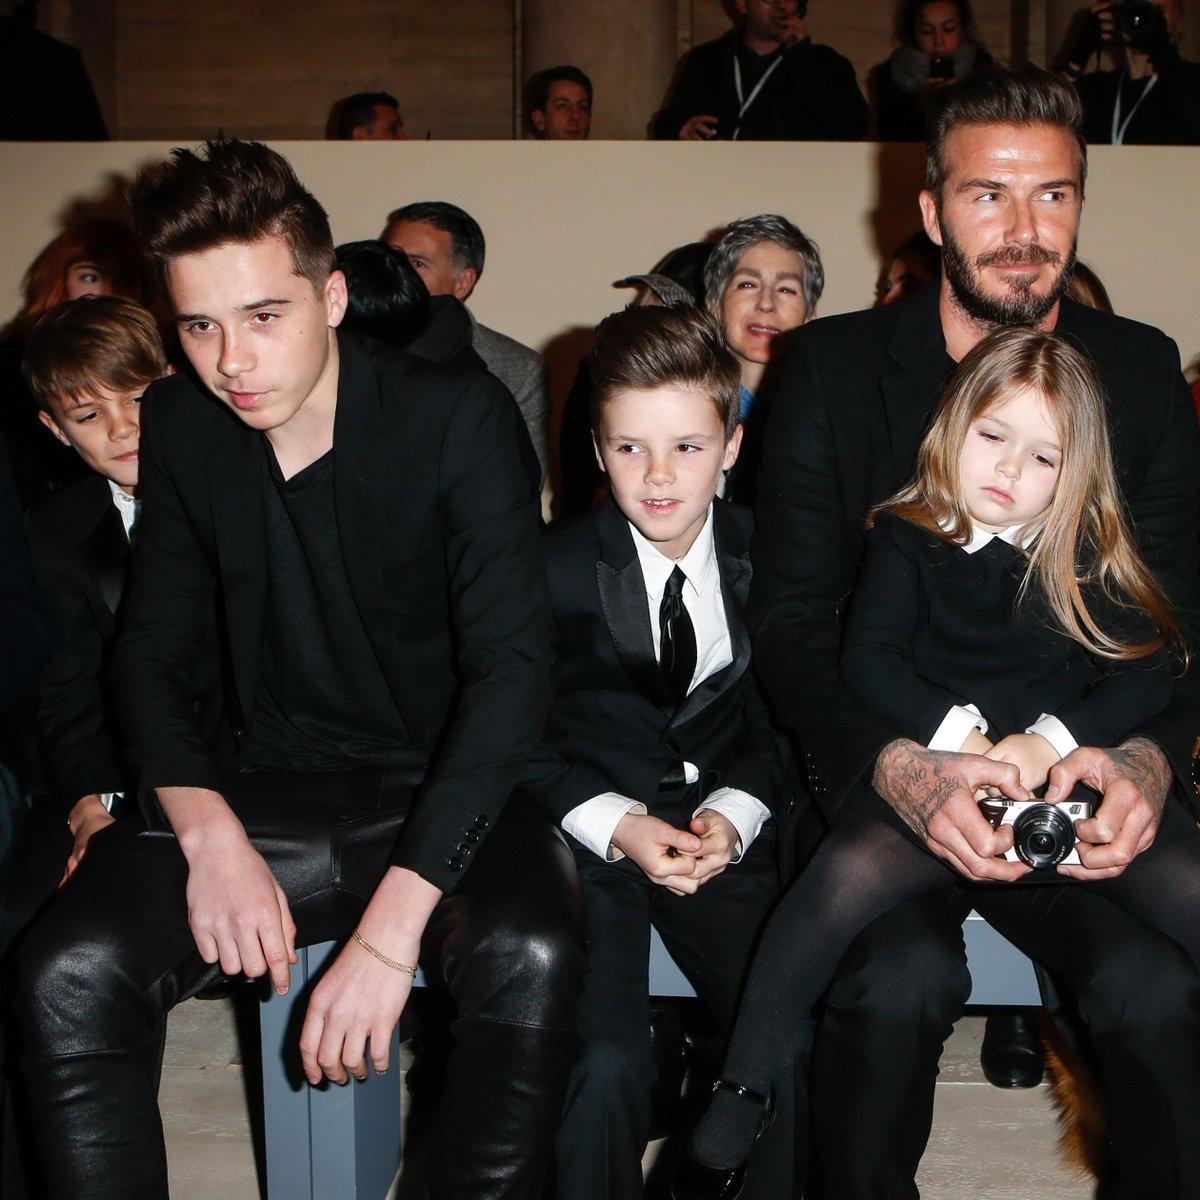 David Beckham sits front row at wife Victoria Beckham's show. (Twitter/ @ELINNF_)